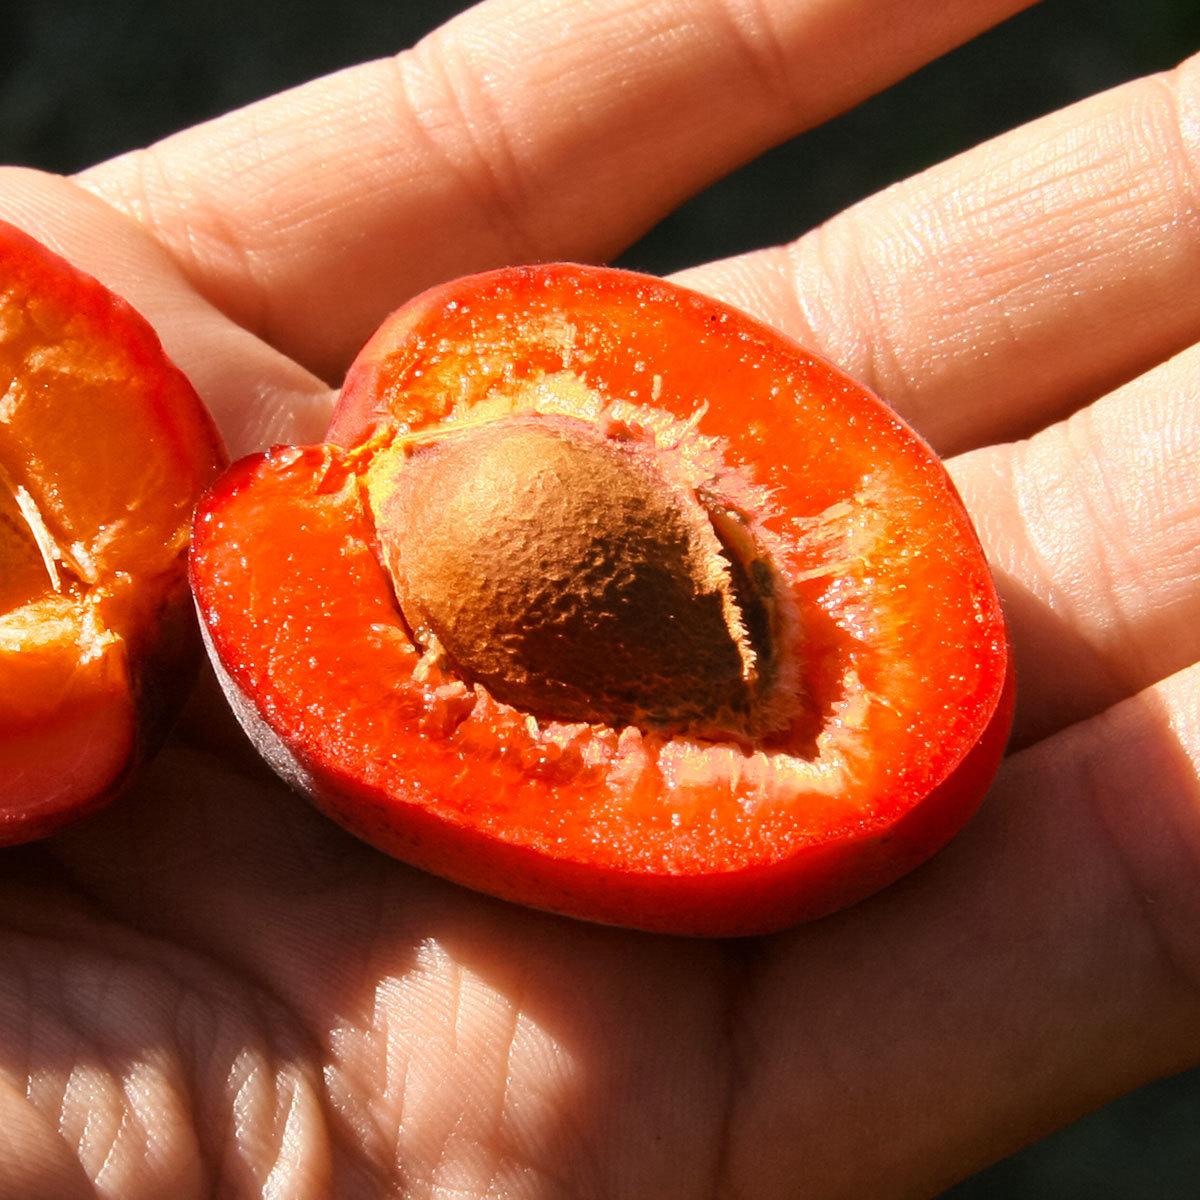 Blutaprikose Evisso | #2